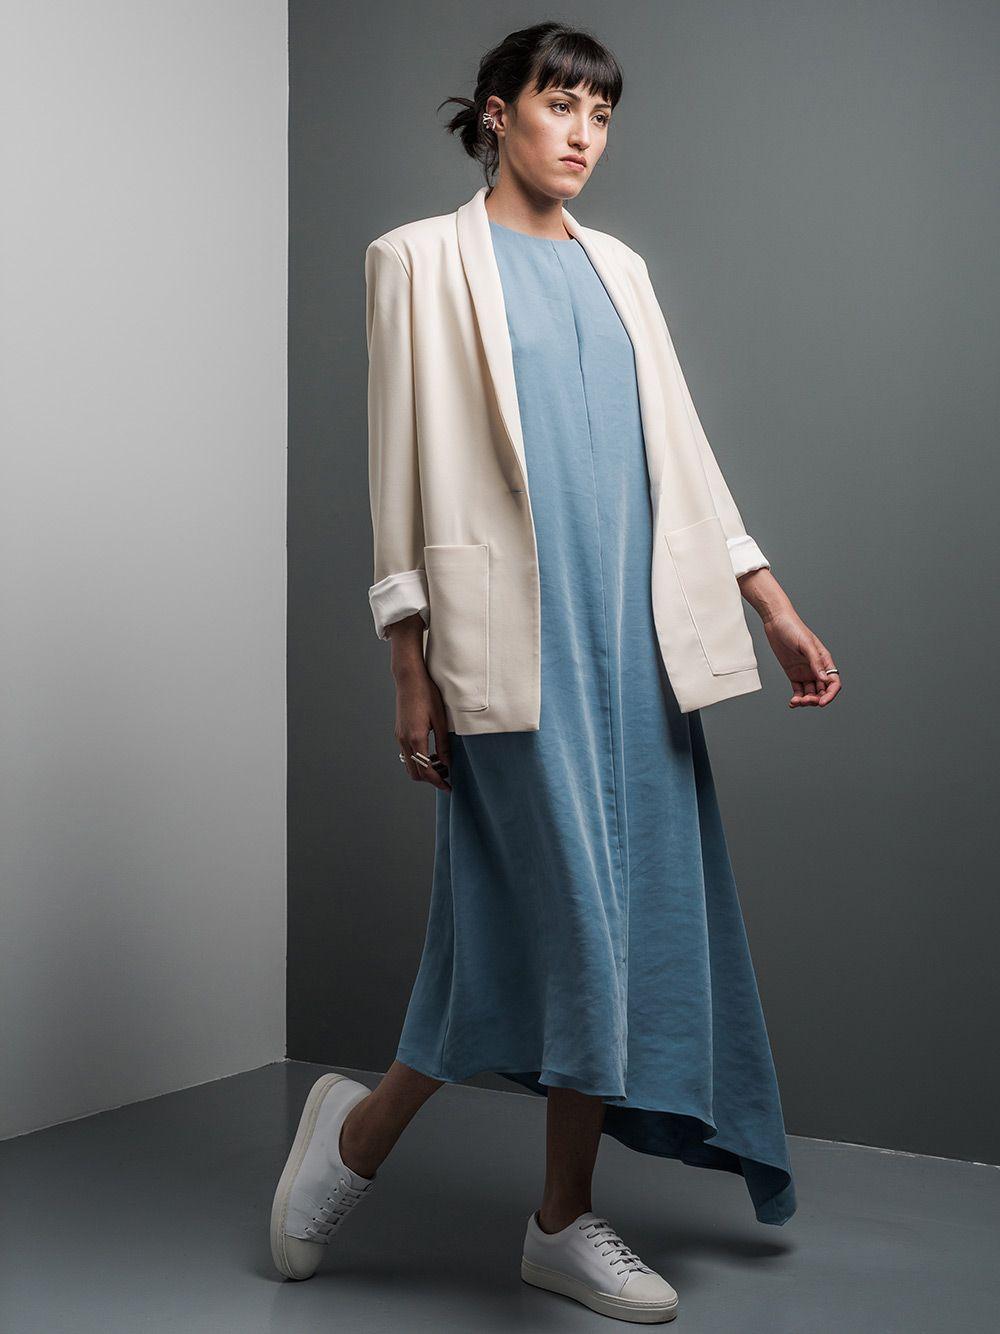 Vestido Assimétrico | Hyena Tailor Made